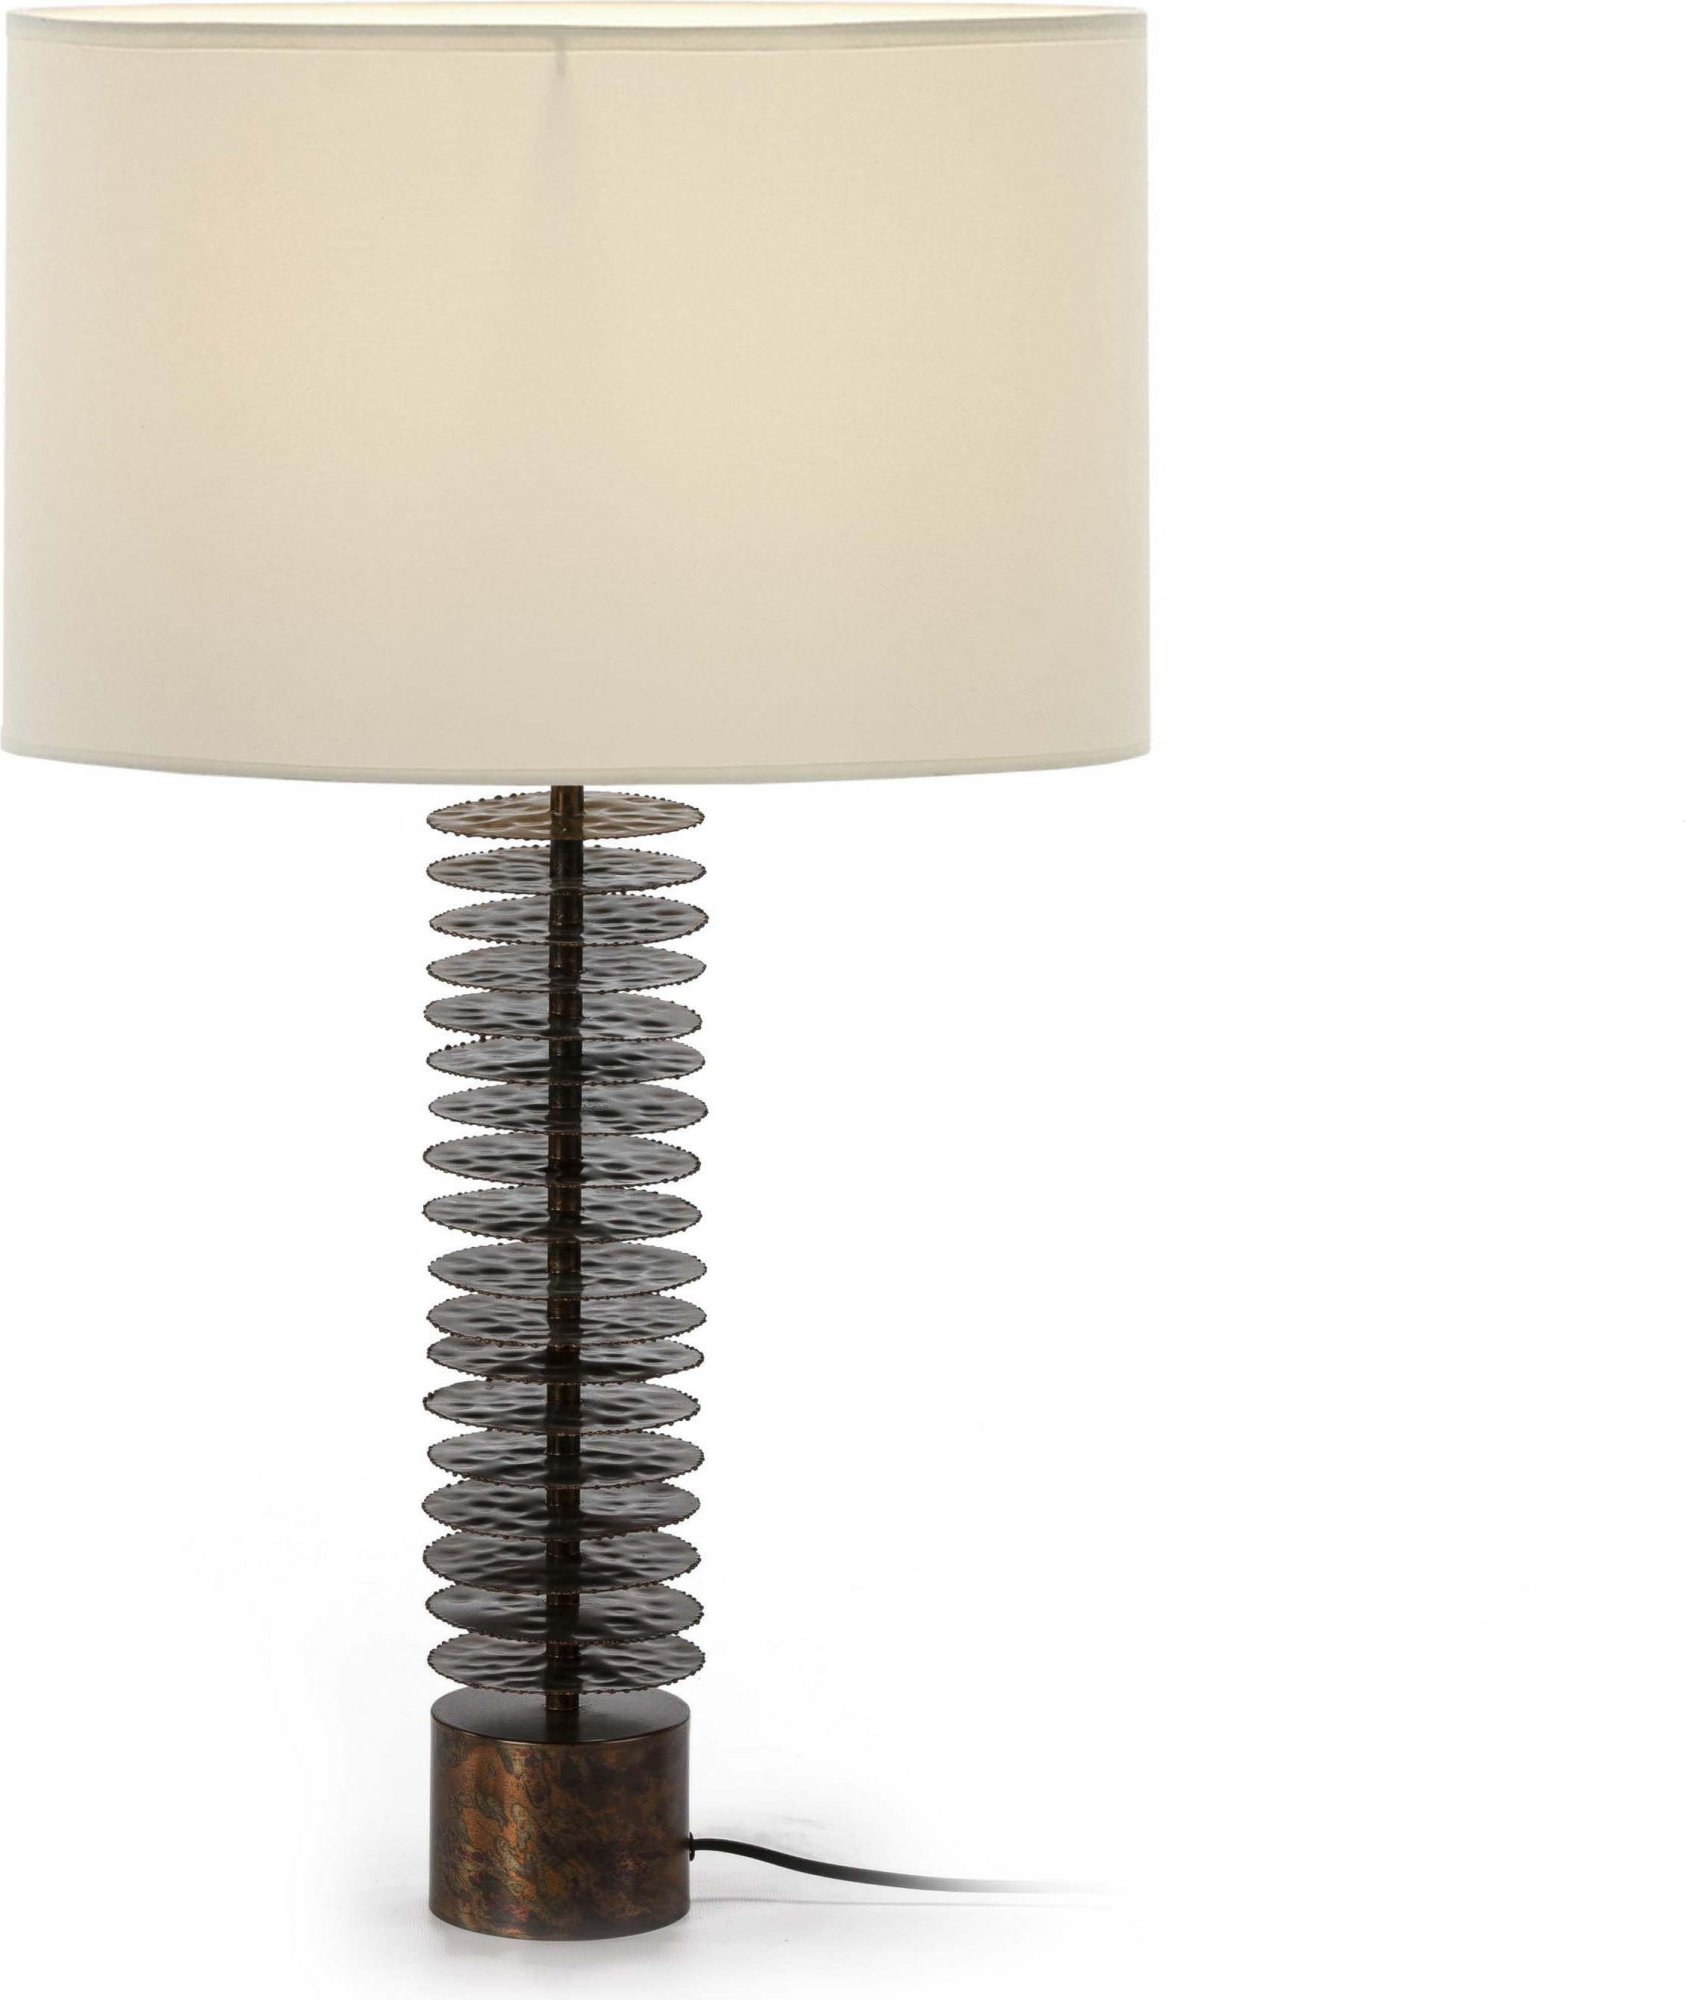 Lampe de table marron